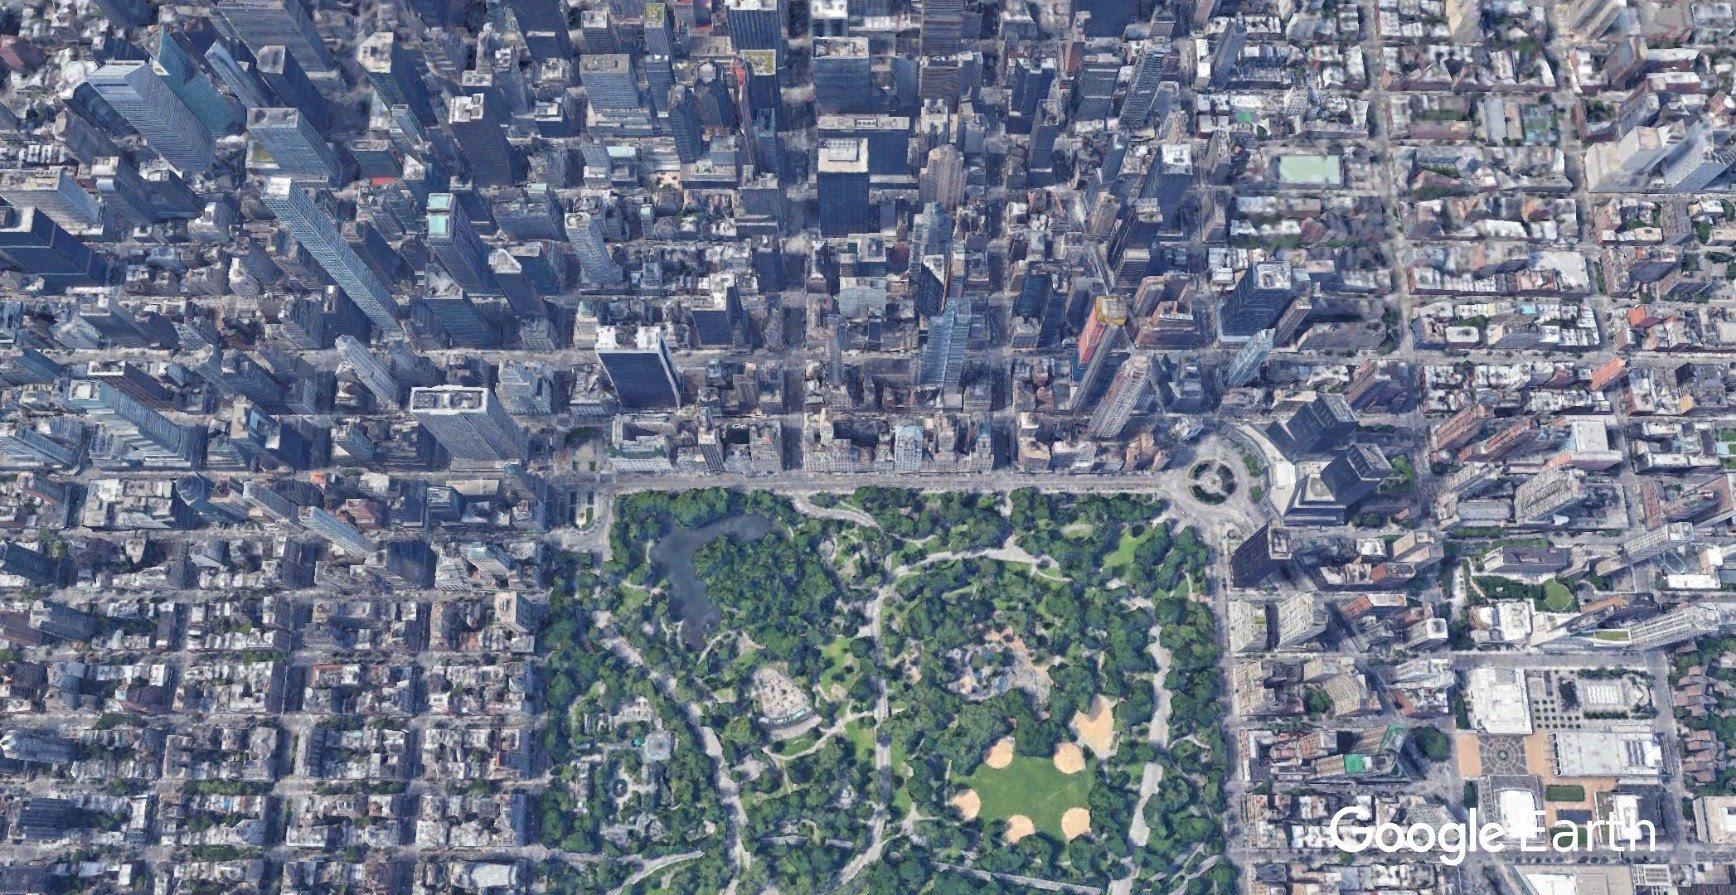 earth_postcard_1569584770.jpg.7f2f82db9276e21ae91f9b9eec9a1fba.jpg